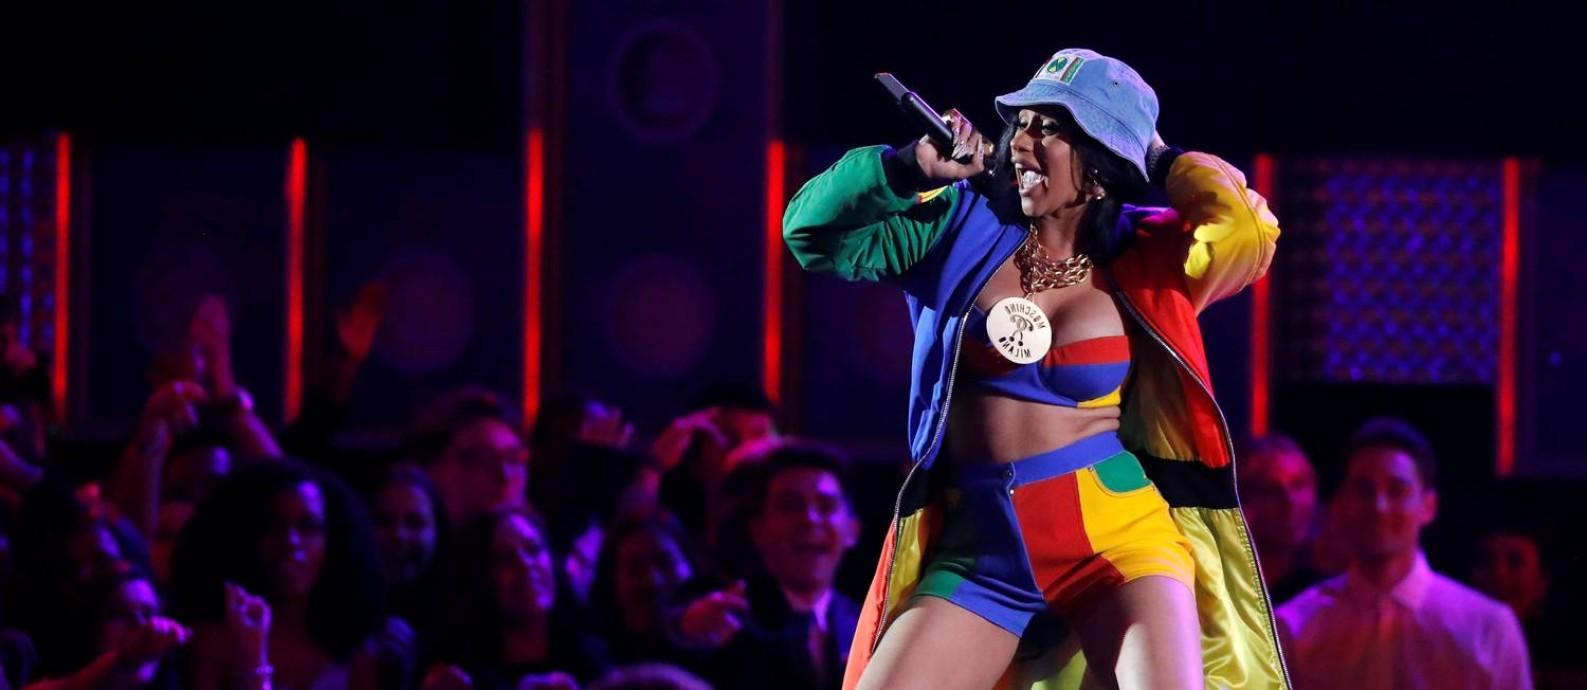 Cardi B se apresentou no Grammy em 2018 Foto: LUCAS JACKSON / REUTERS